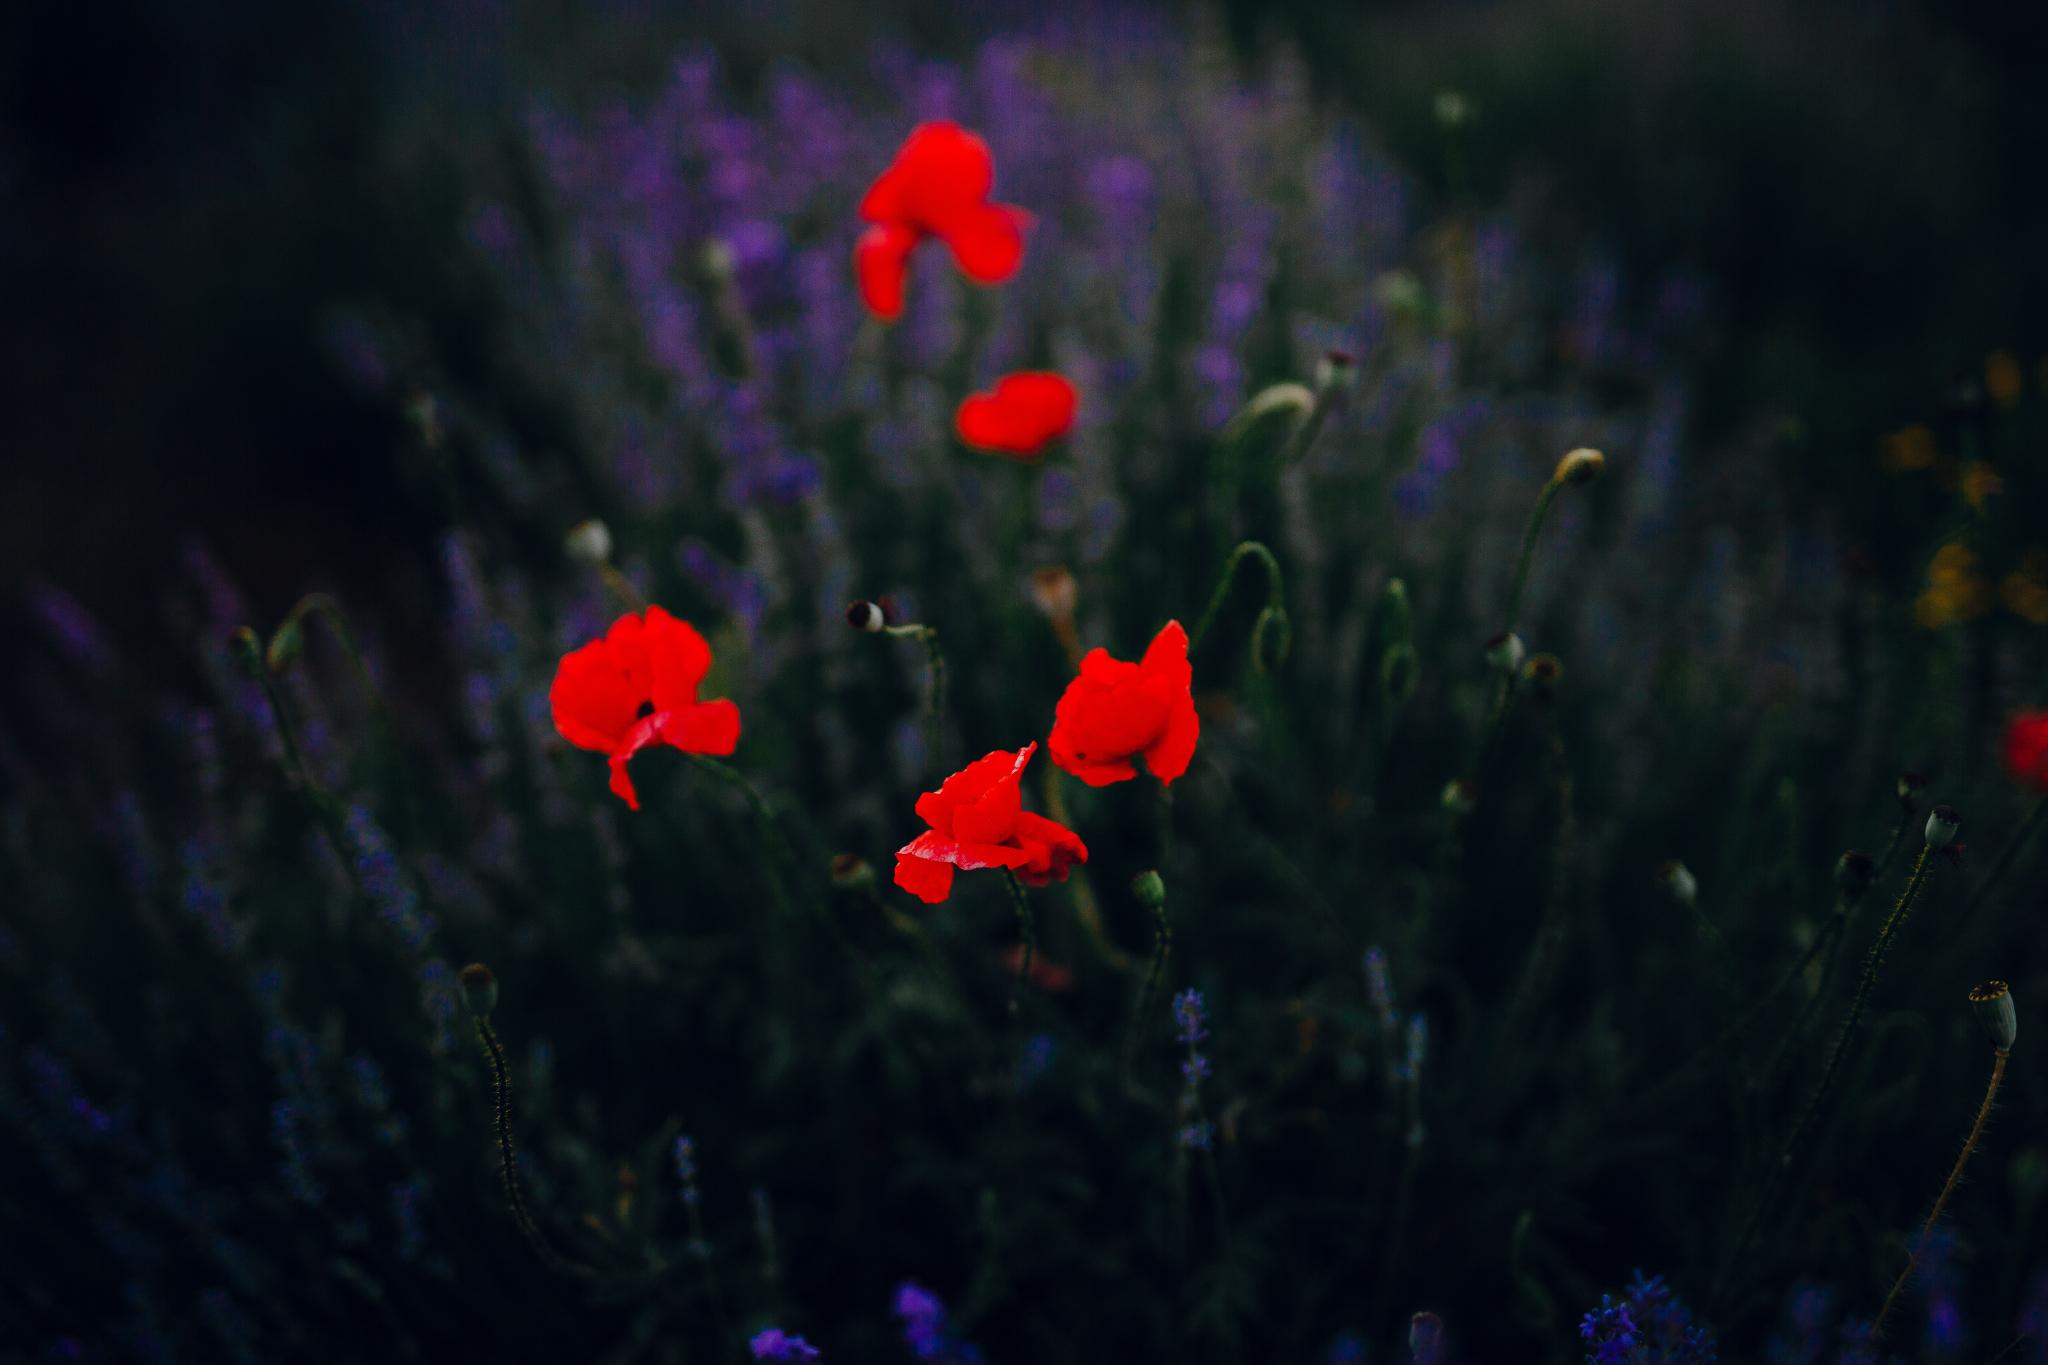 san diego wedding   photographer | red poppy flowers in lavender fields